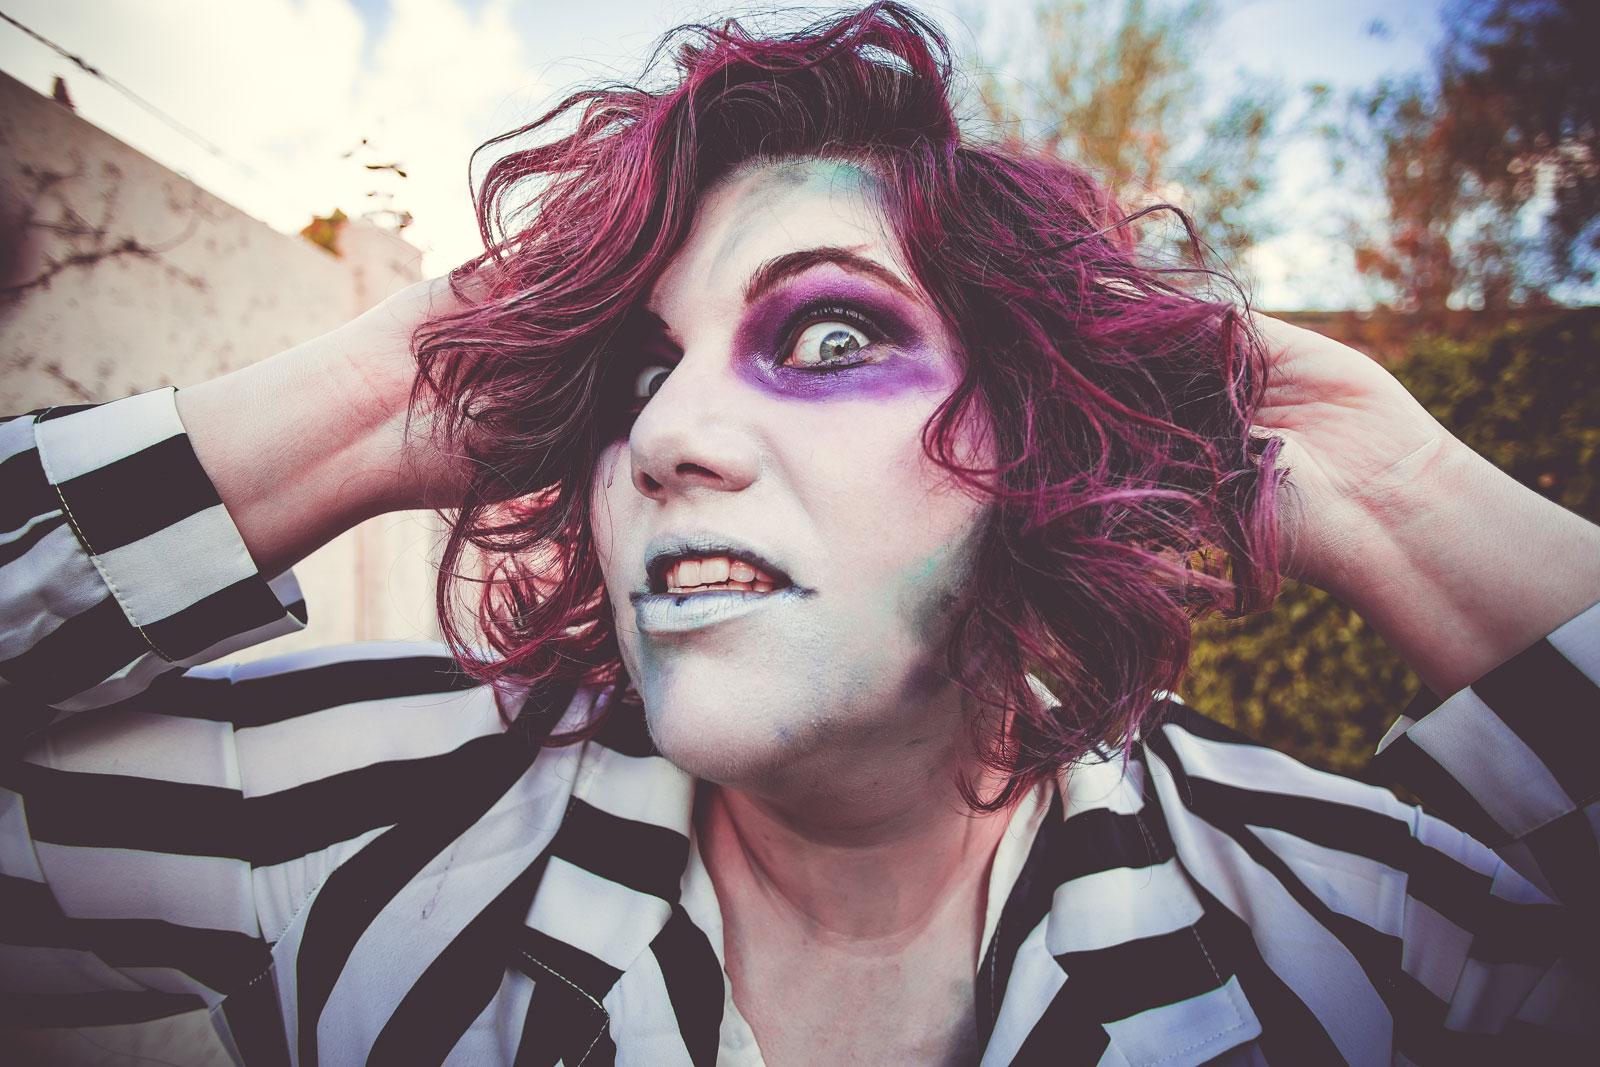 Beetlejuice, ninaah bulles, halloween, costume, maquillahe, shein grande taille, plussize